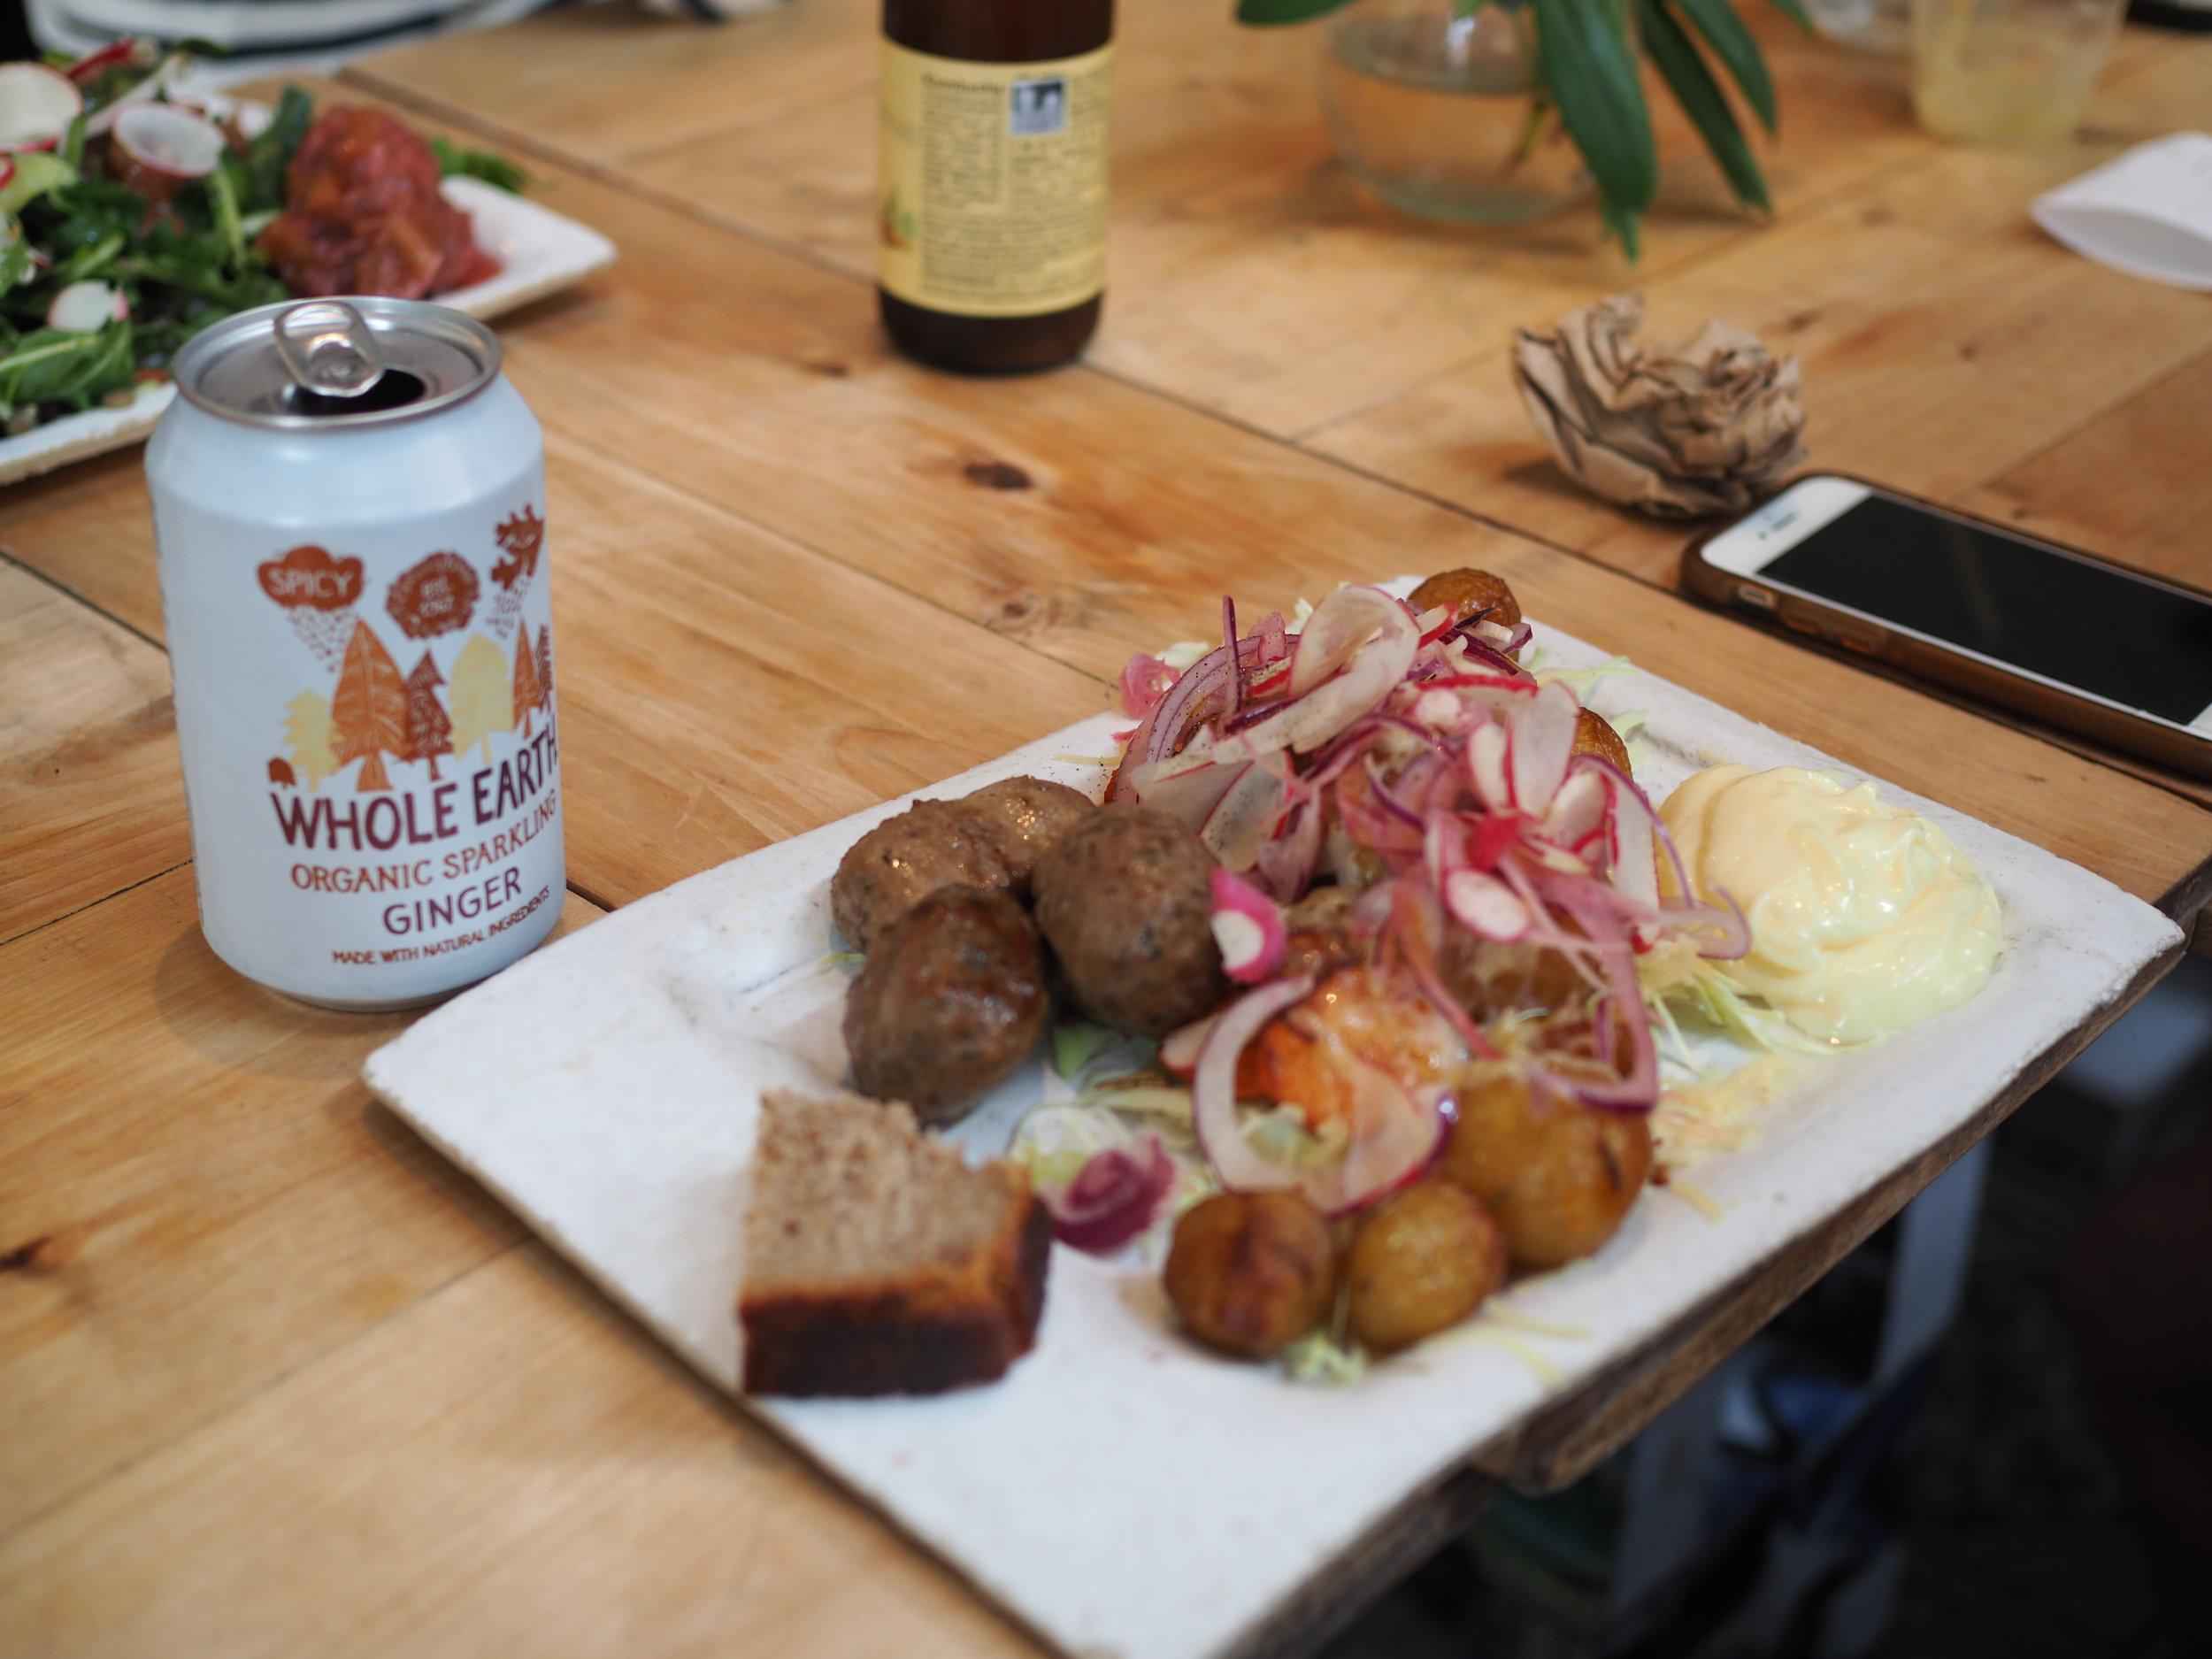 Lunch at Kalf & Hansen